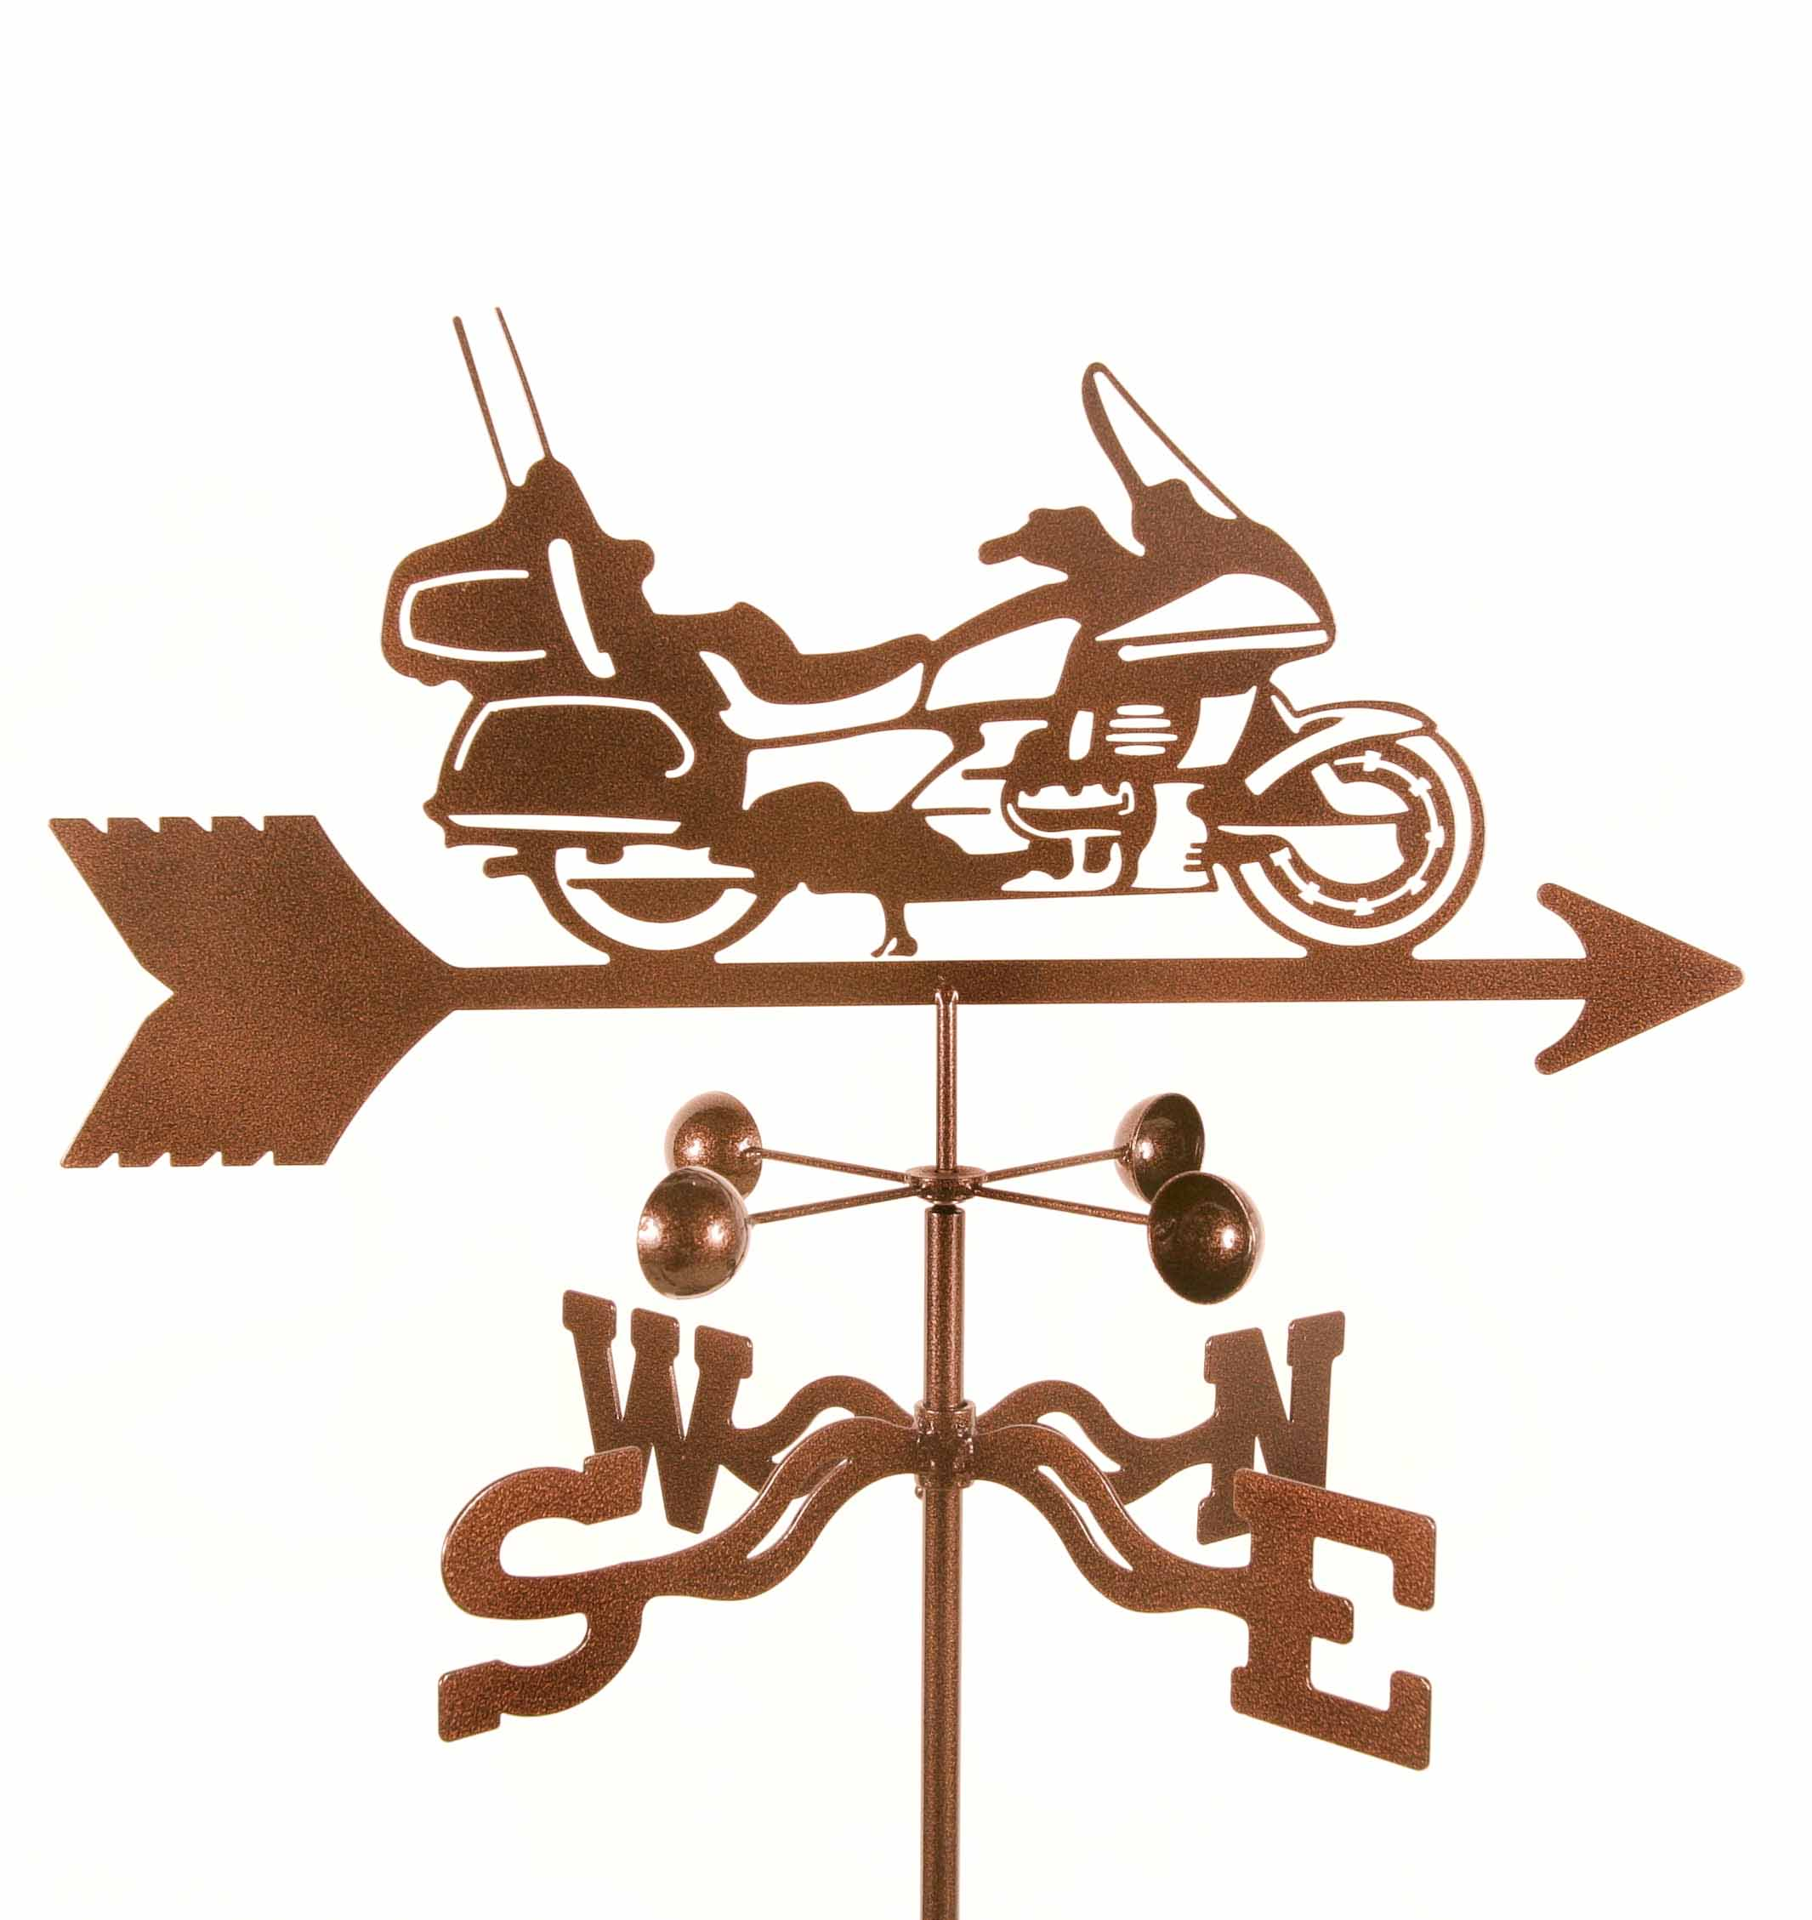 Touring Gold Wing Motorcycle Weathervane-0